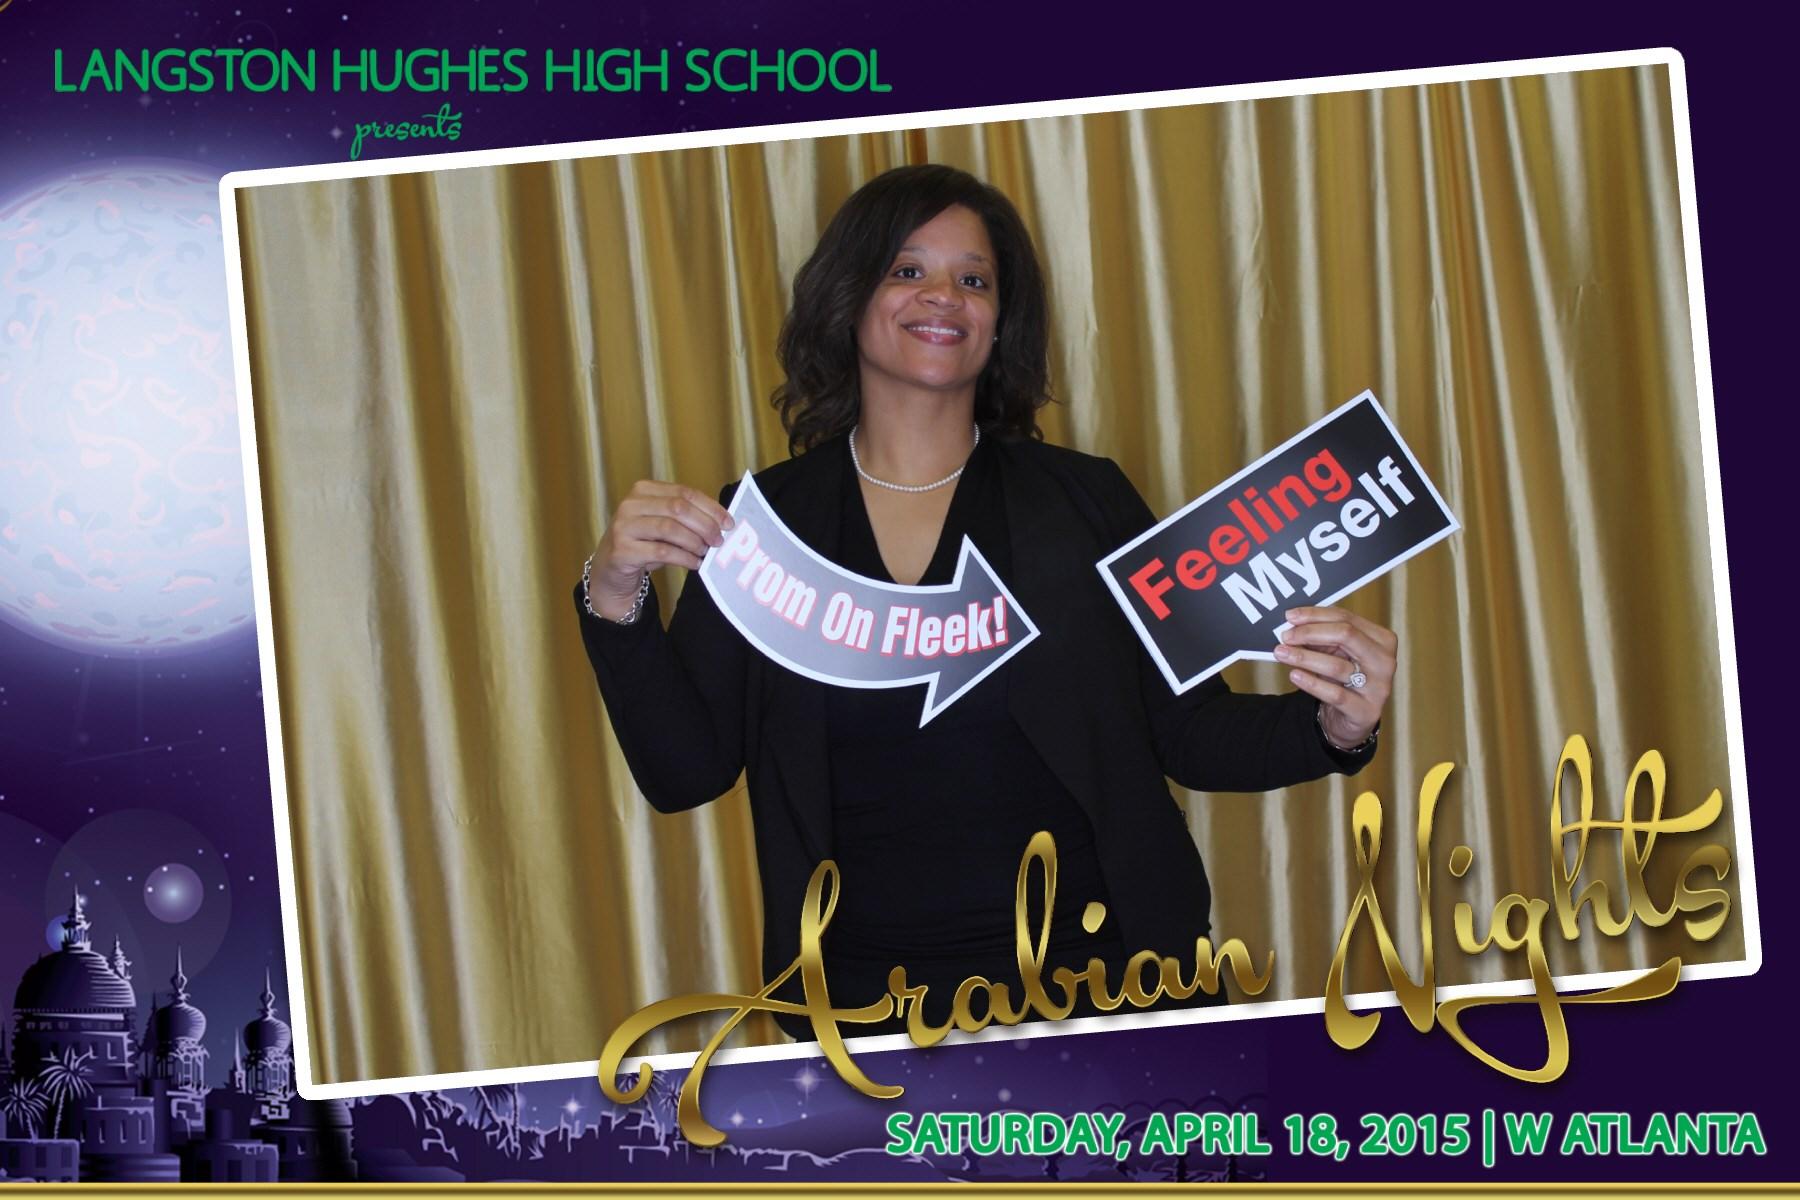 Atlanta Prom Photo Booth